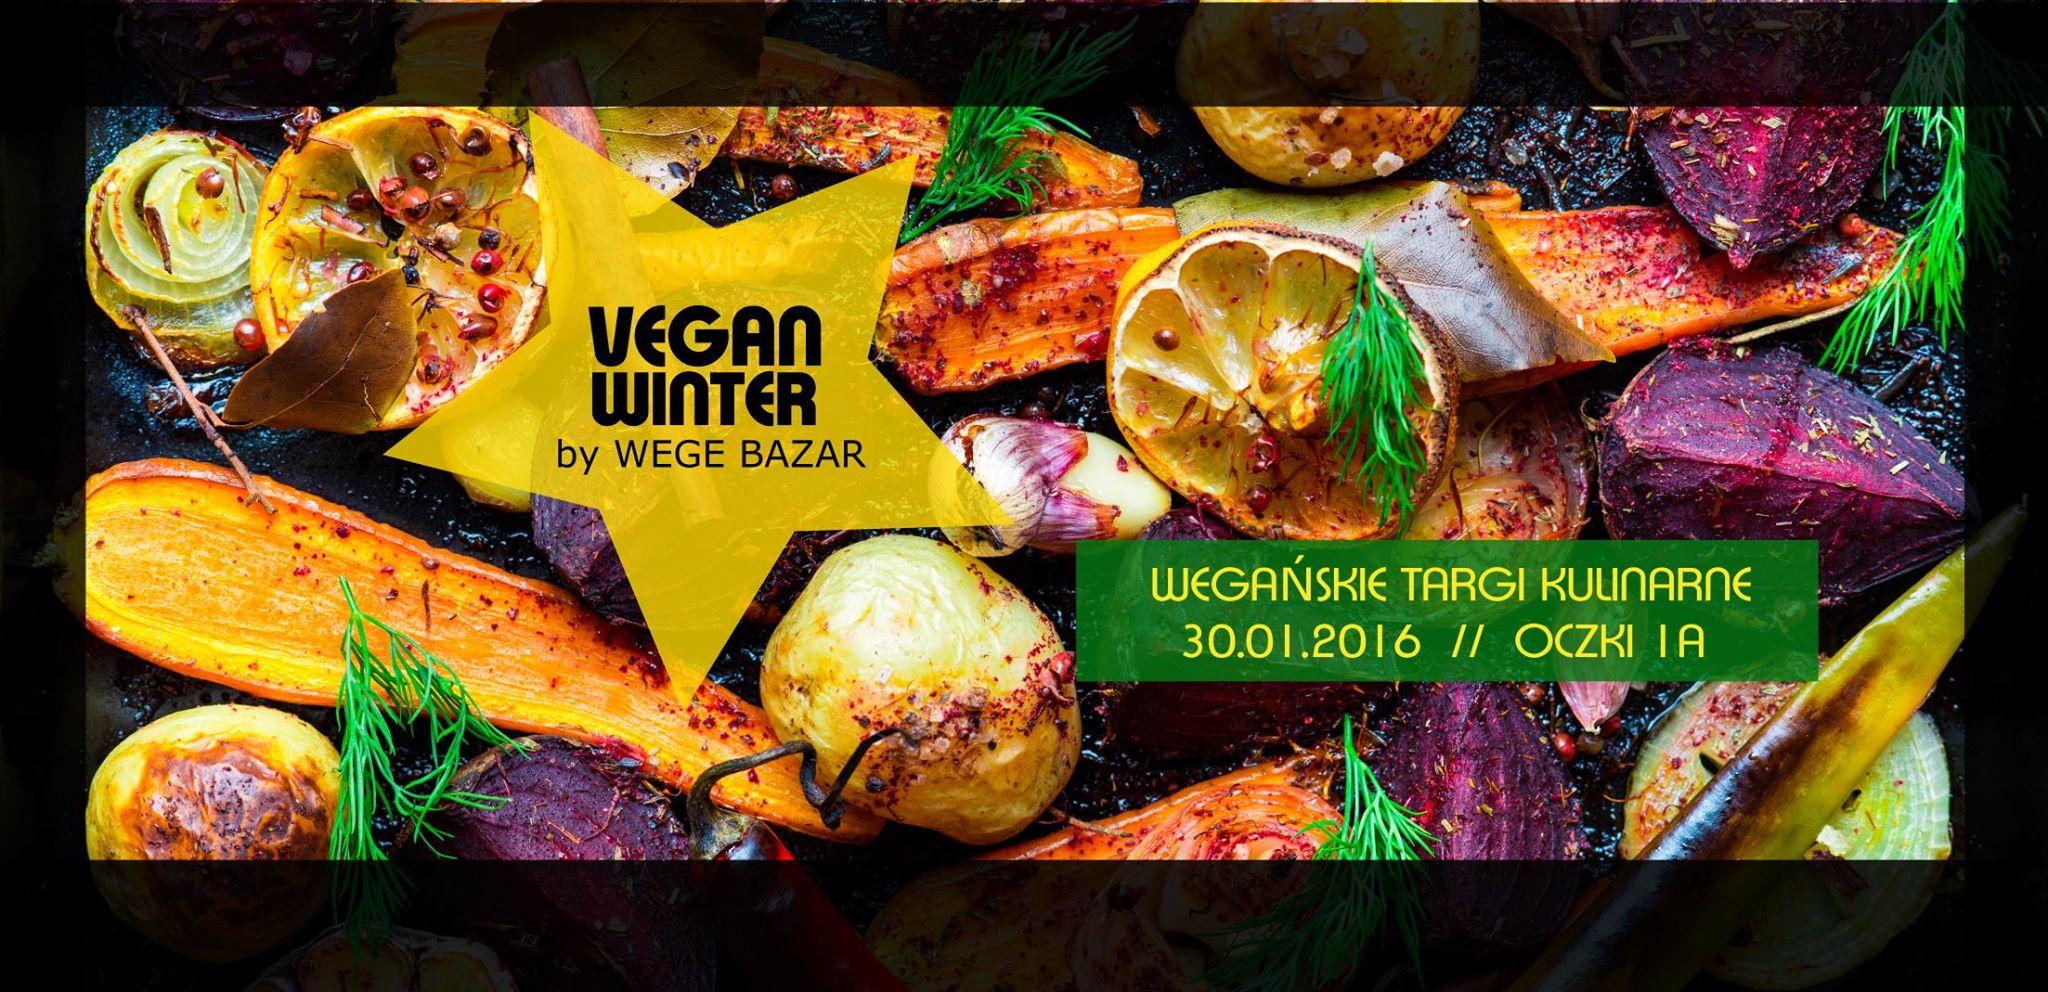 Vegan Winter